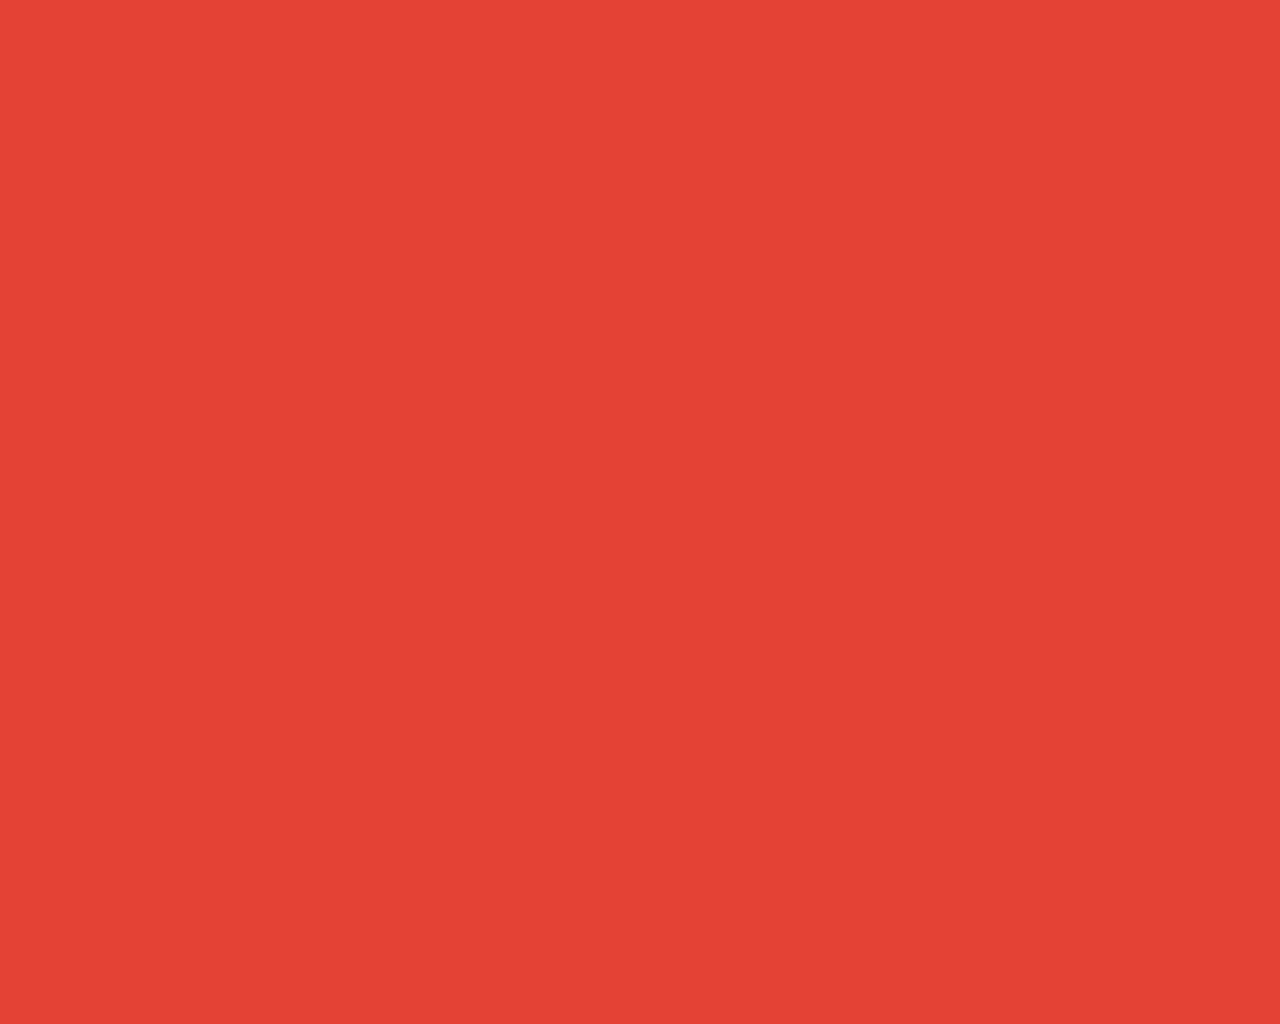 1280x1024 Vermilion Cinnabar Solid Color Background